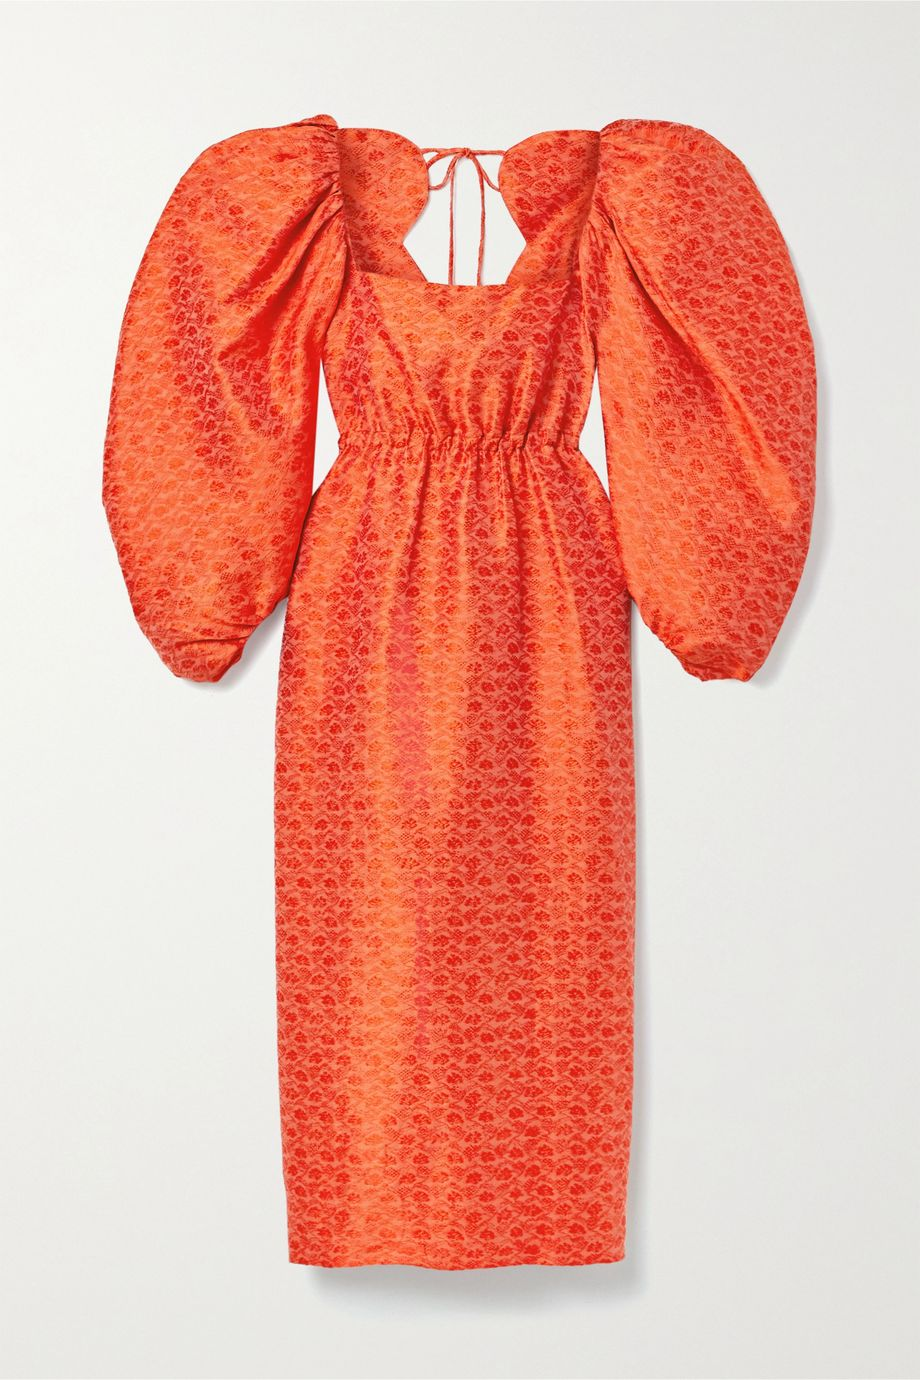 Rosie Assoulin Madame Butterfly brocade midi dress